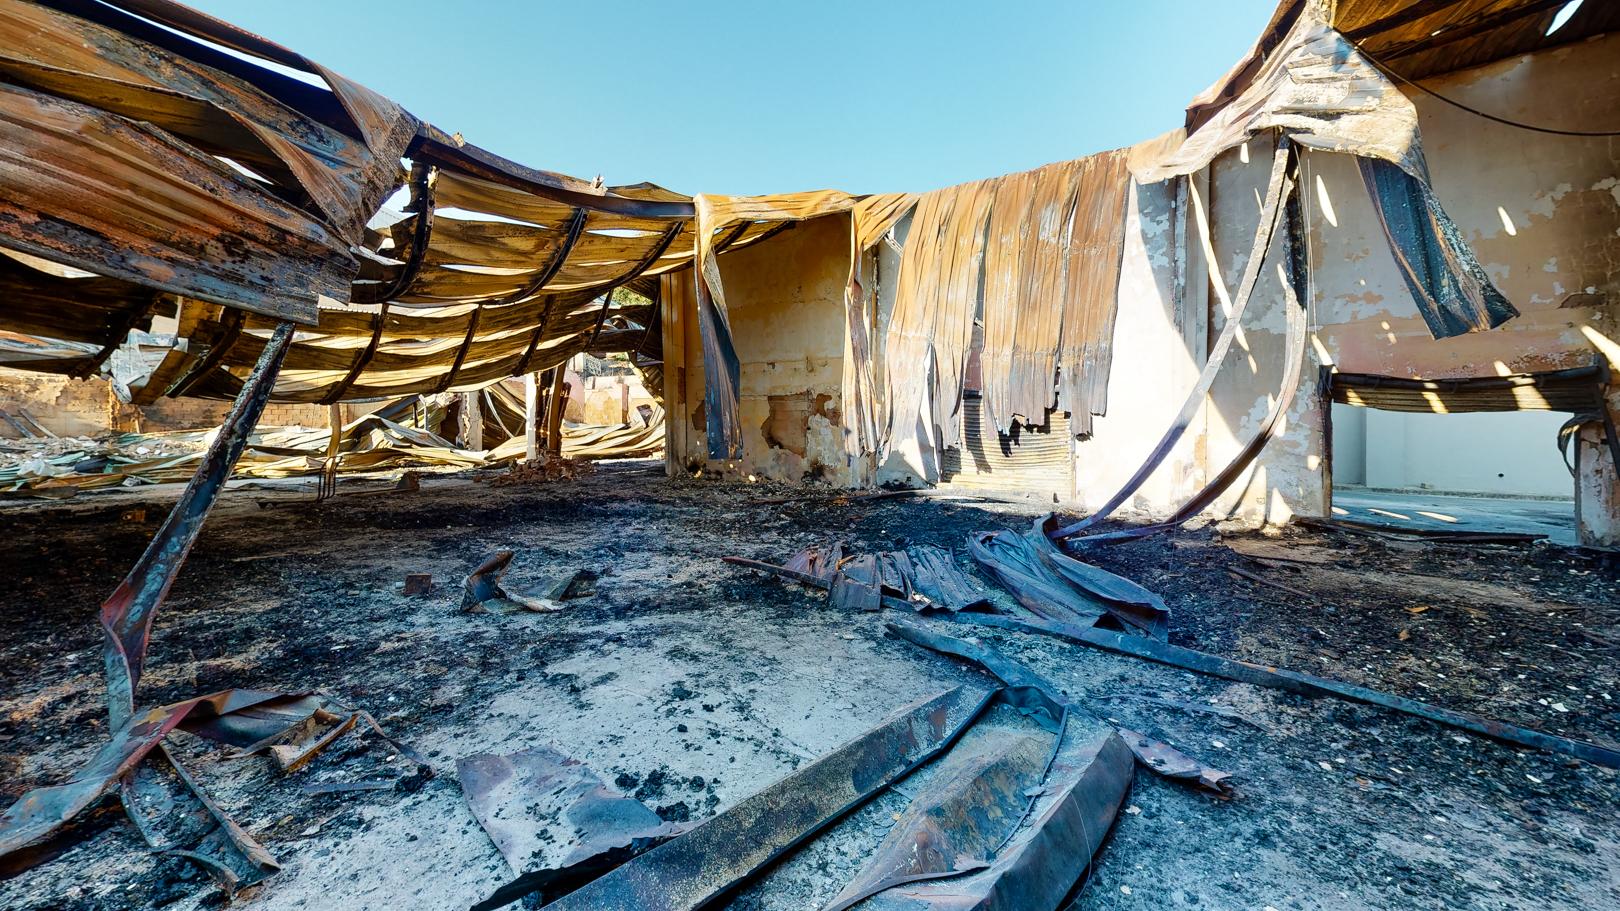 Rory Baker Photography, 3603D Virtual Tours, Matterport, insurance